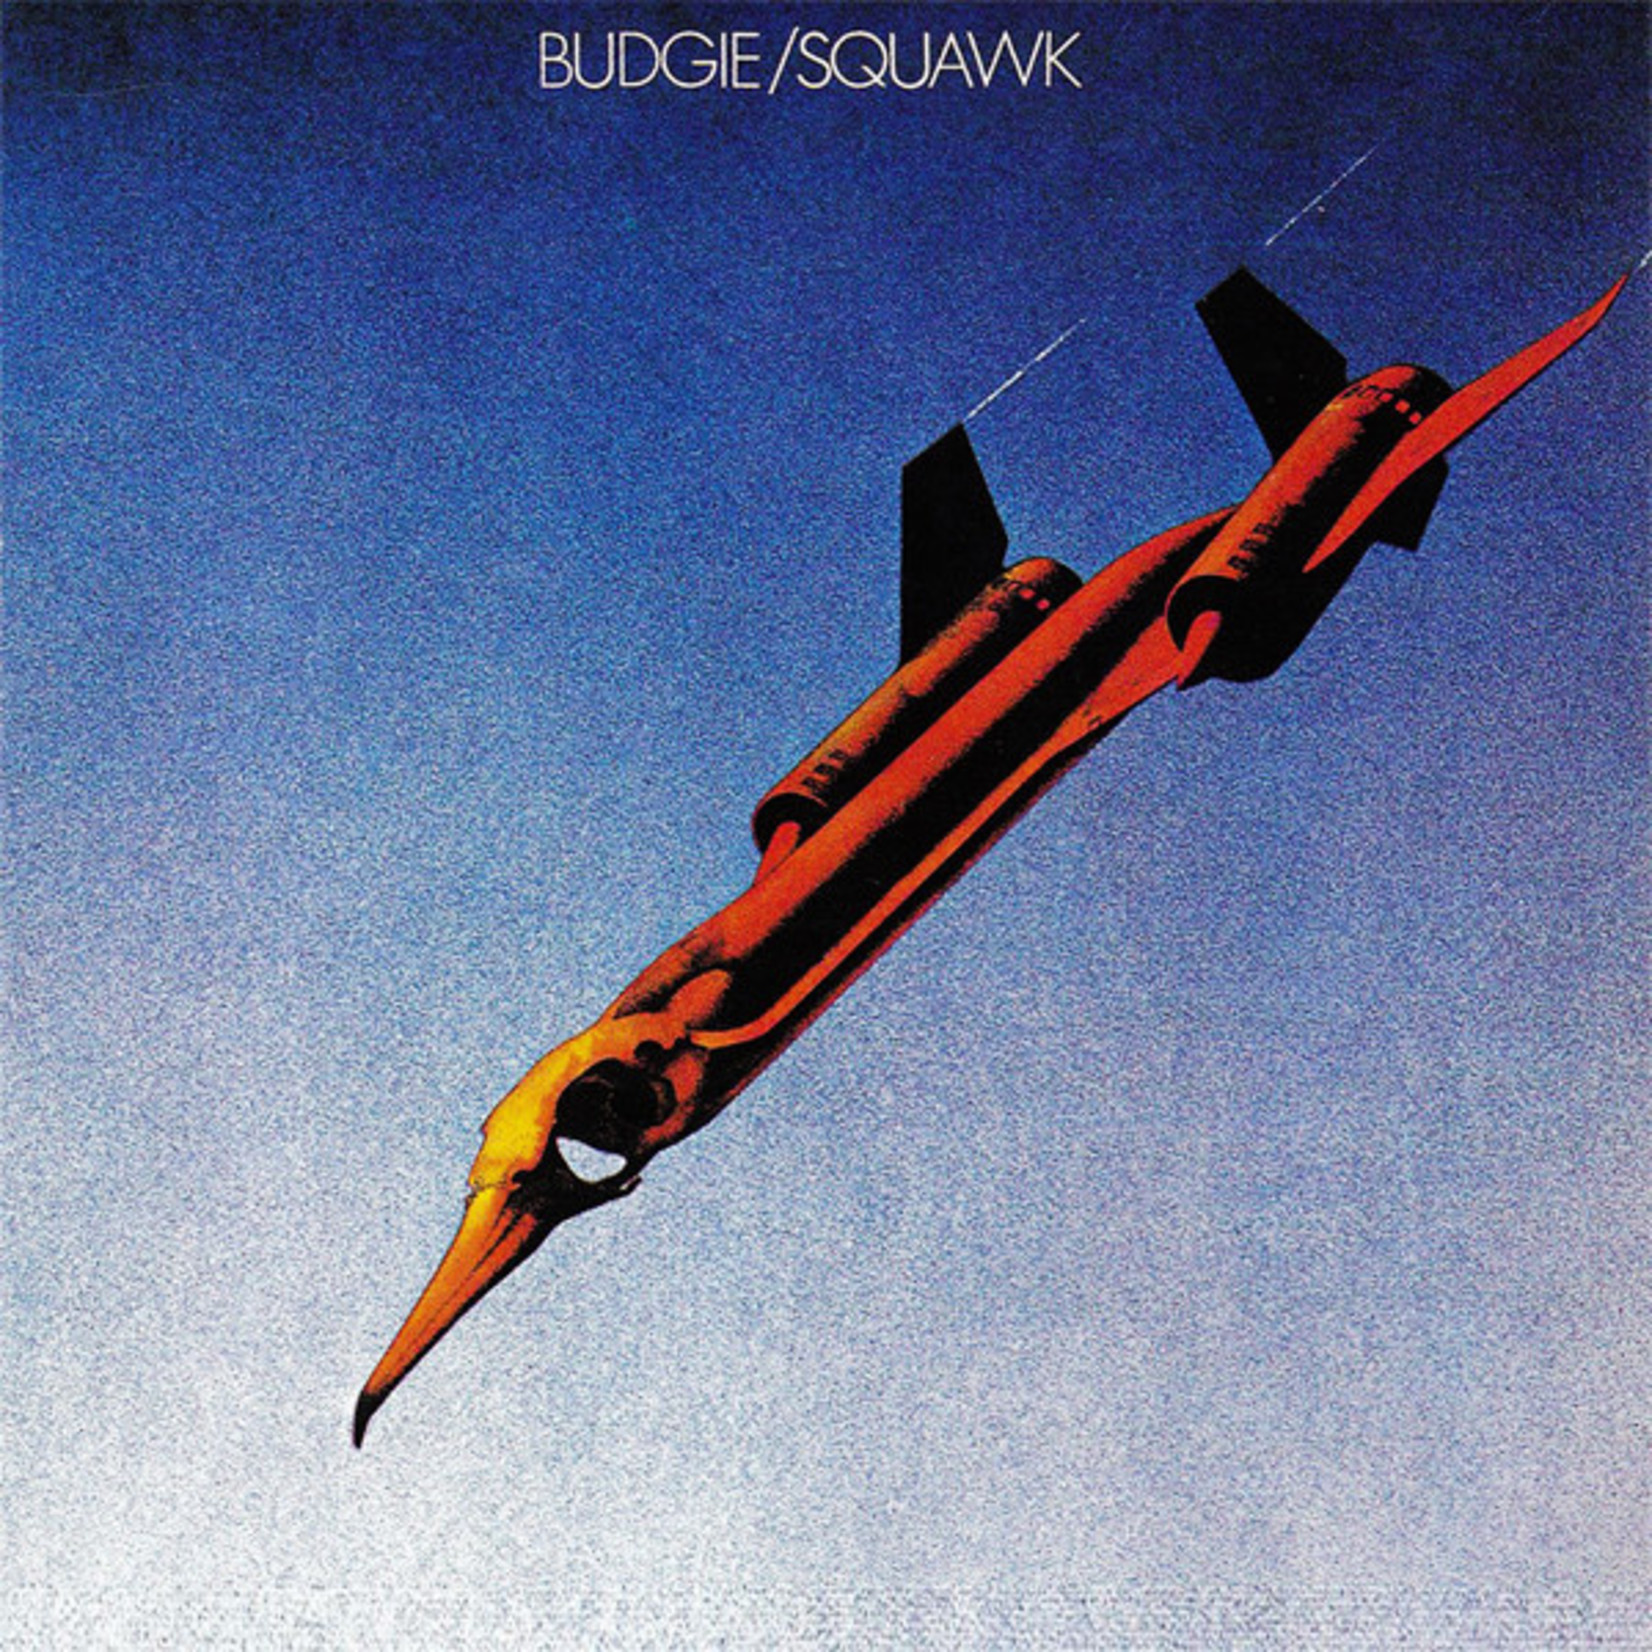 Vinyl Budgie - Squawk